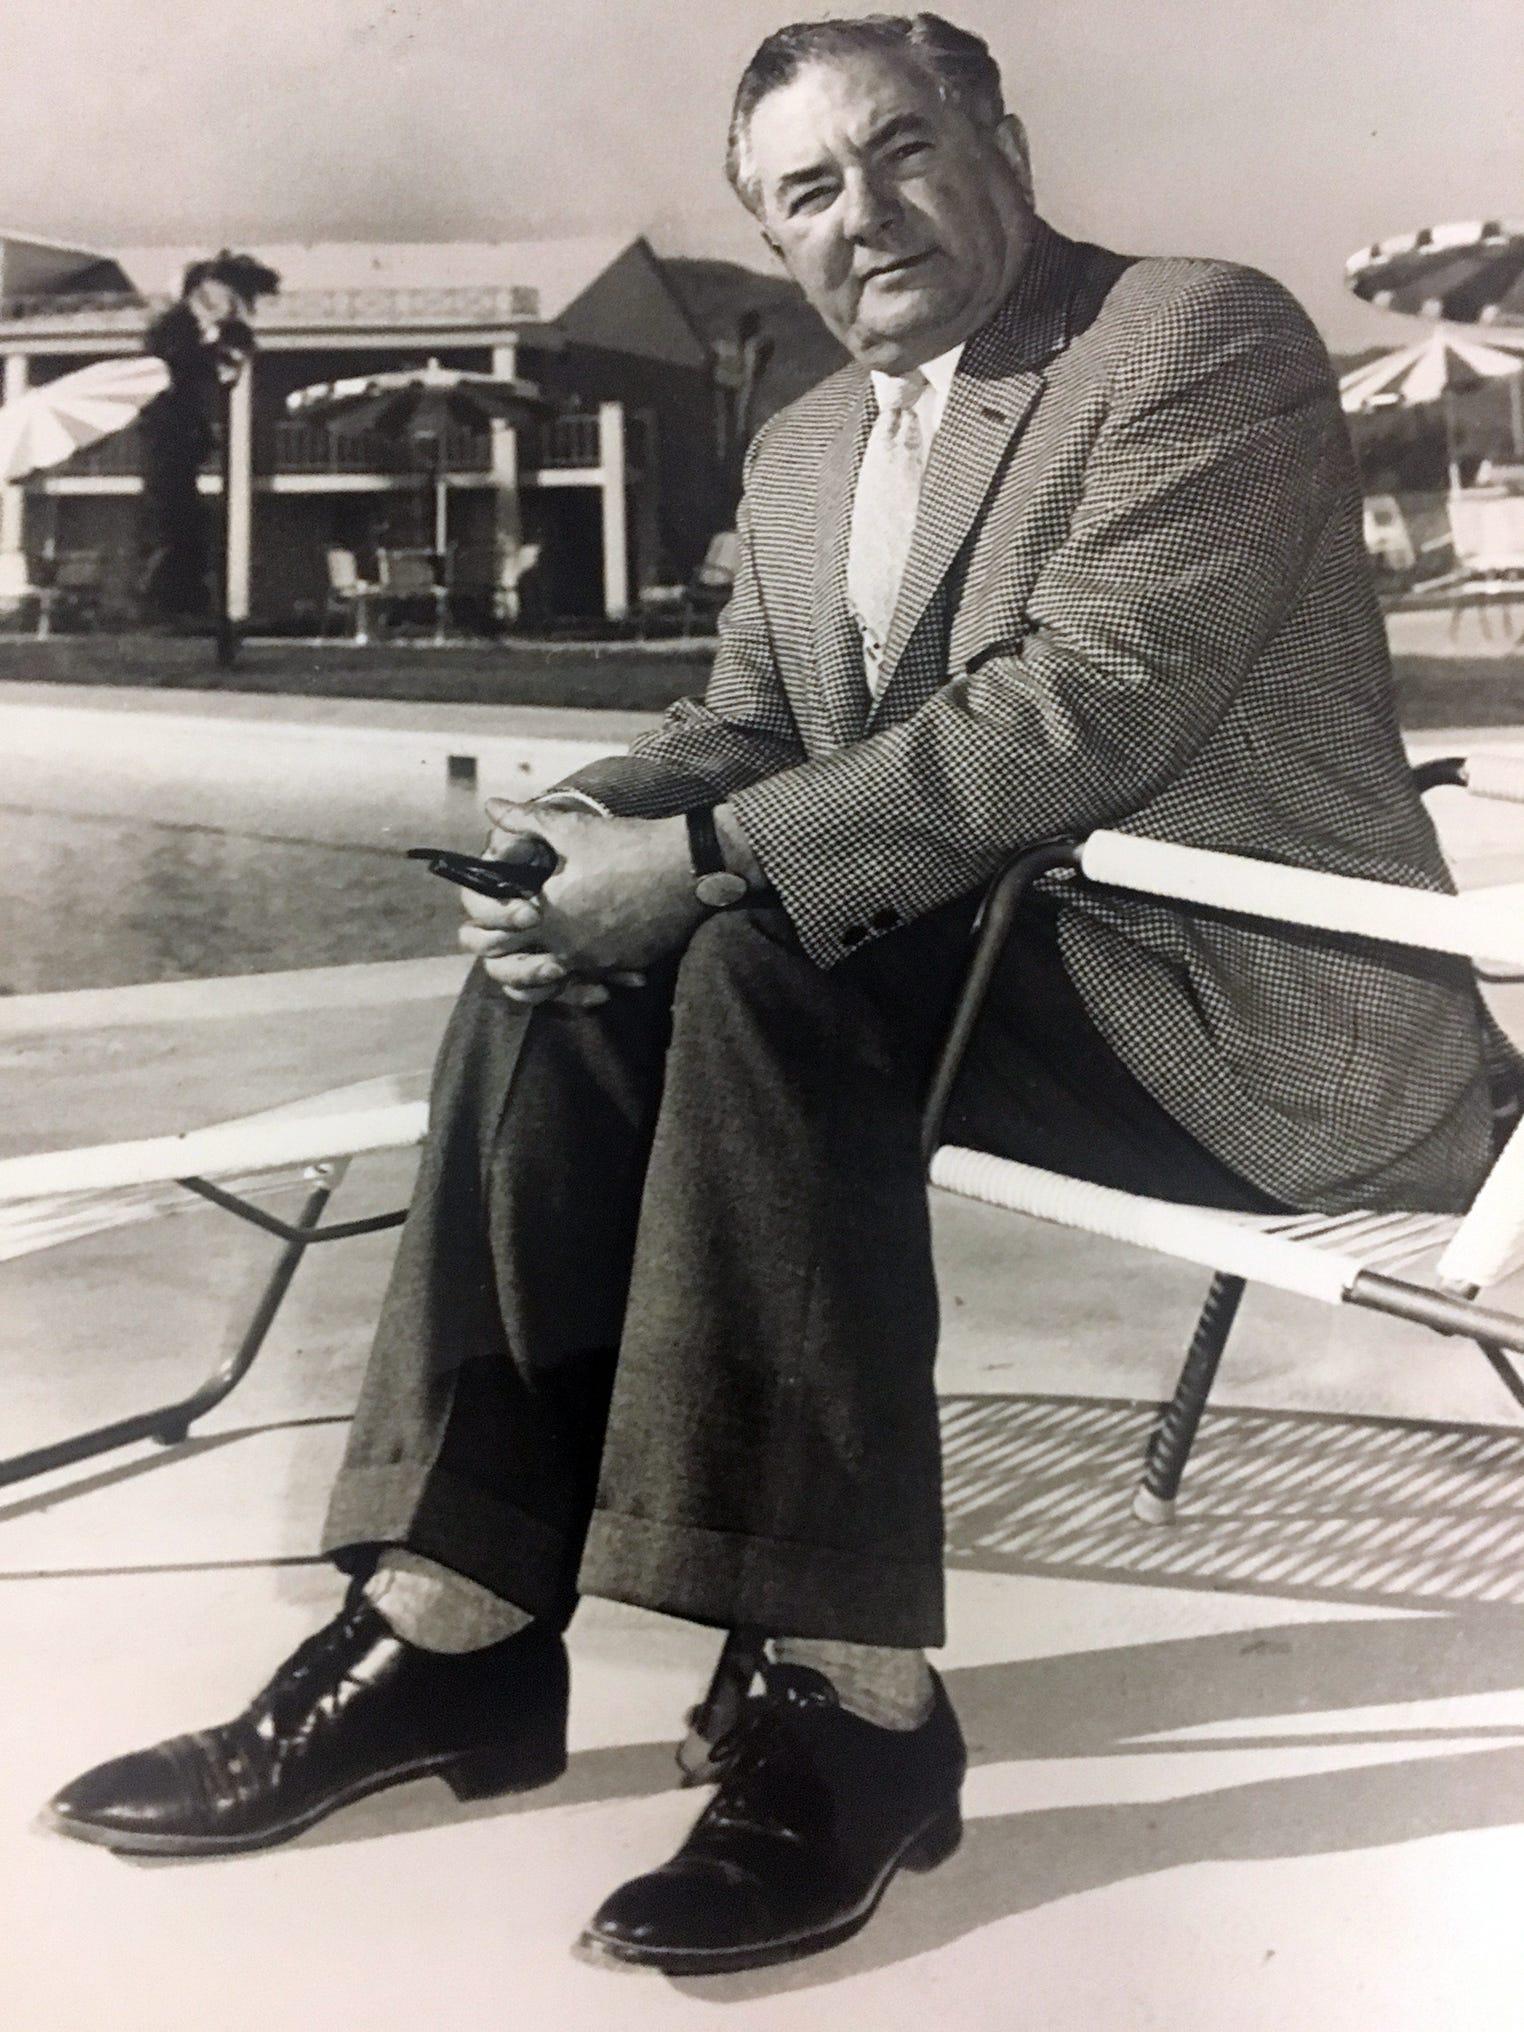 Peter Licavoli Sr. at a Tucson motel. Year unknown.